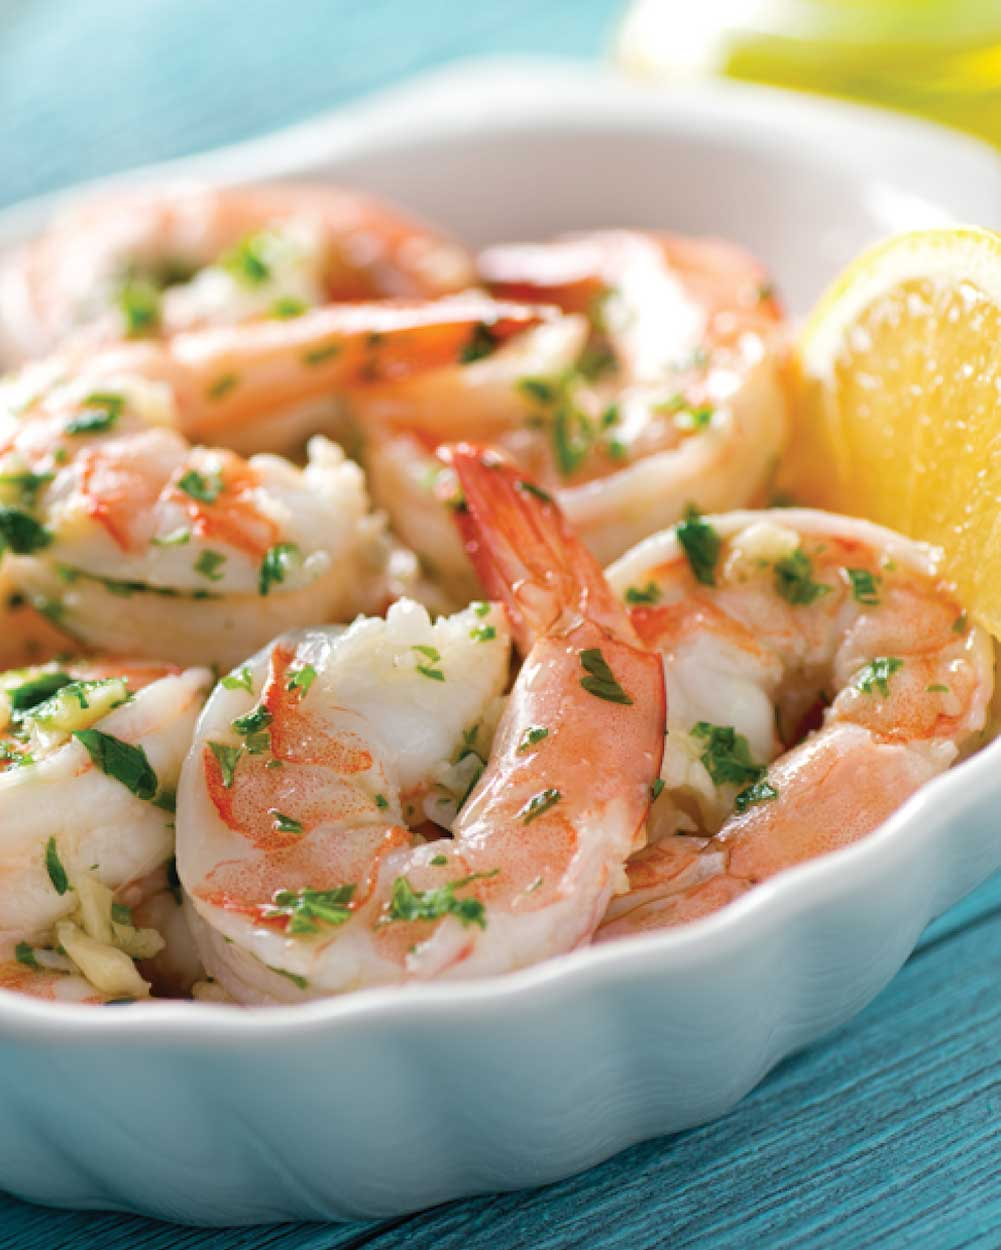 Lemon-Dill Shrimp